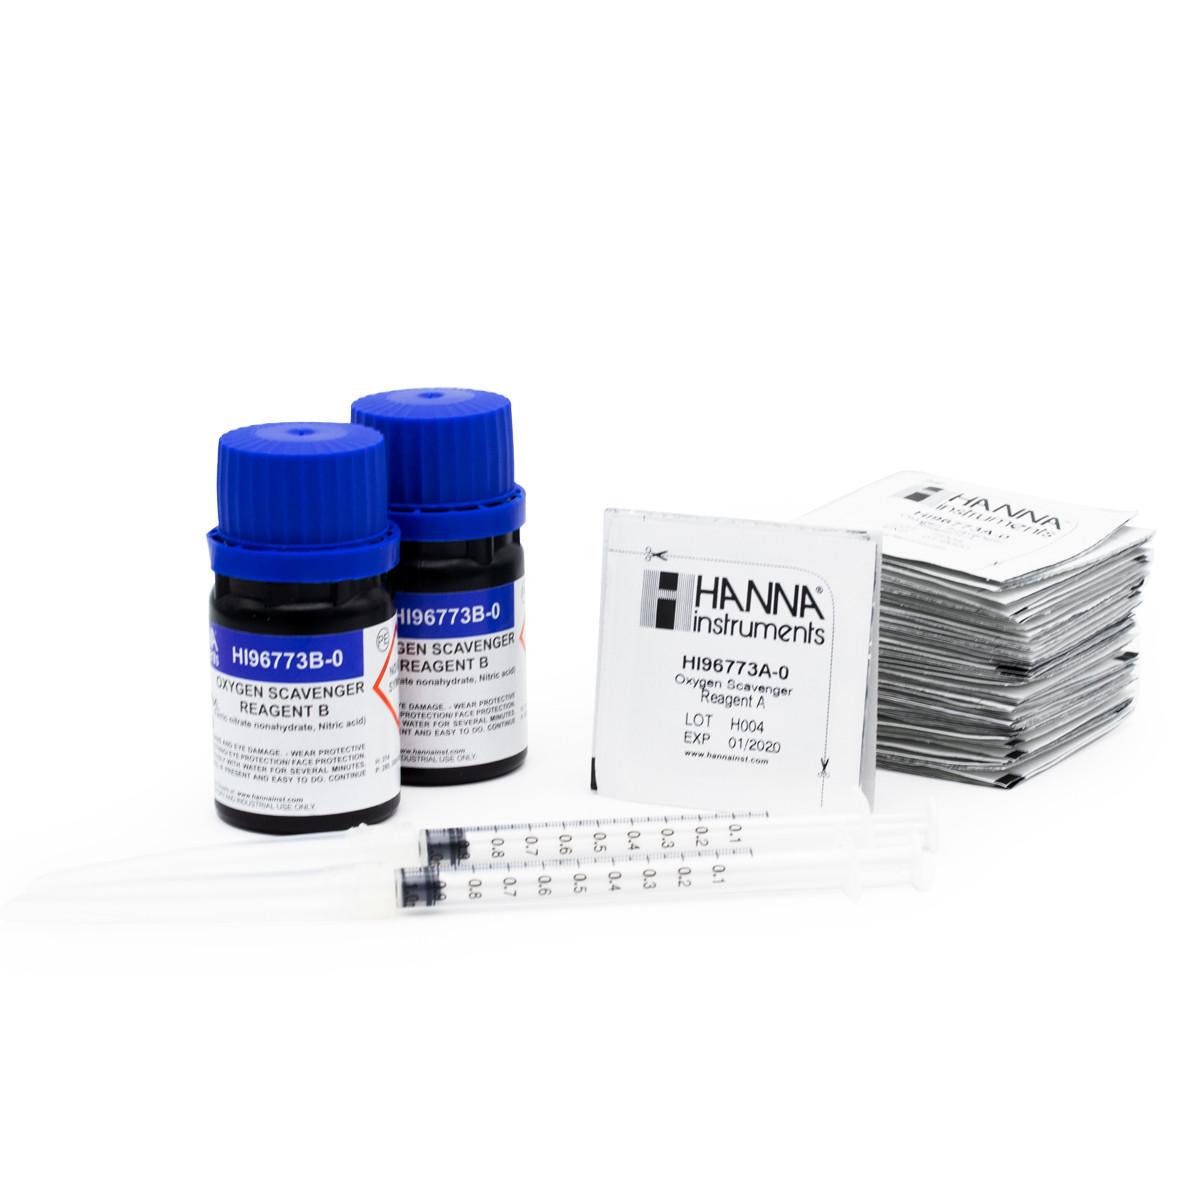 Oxygen Scavengers Reagents (50 tests)